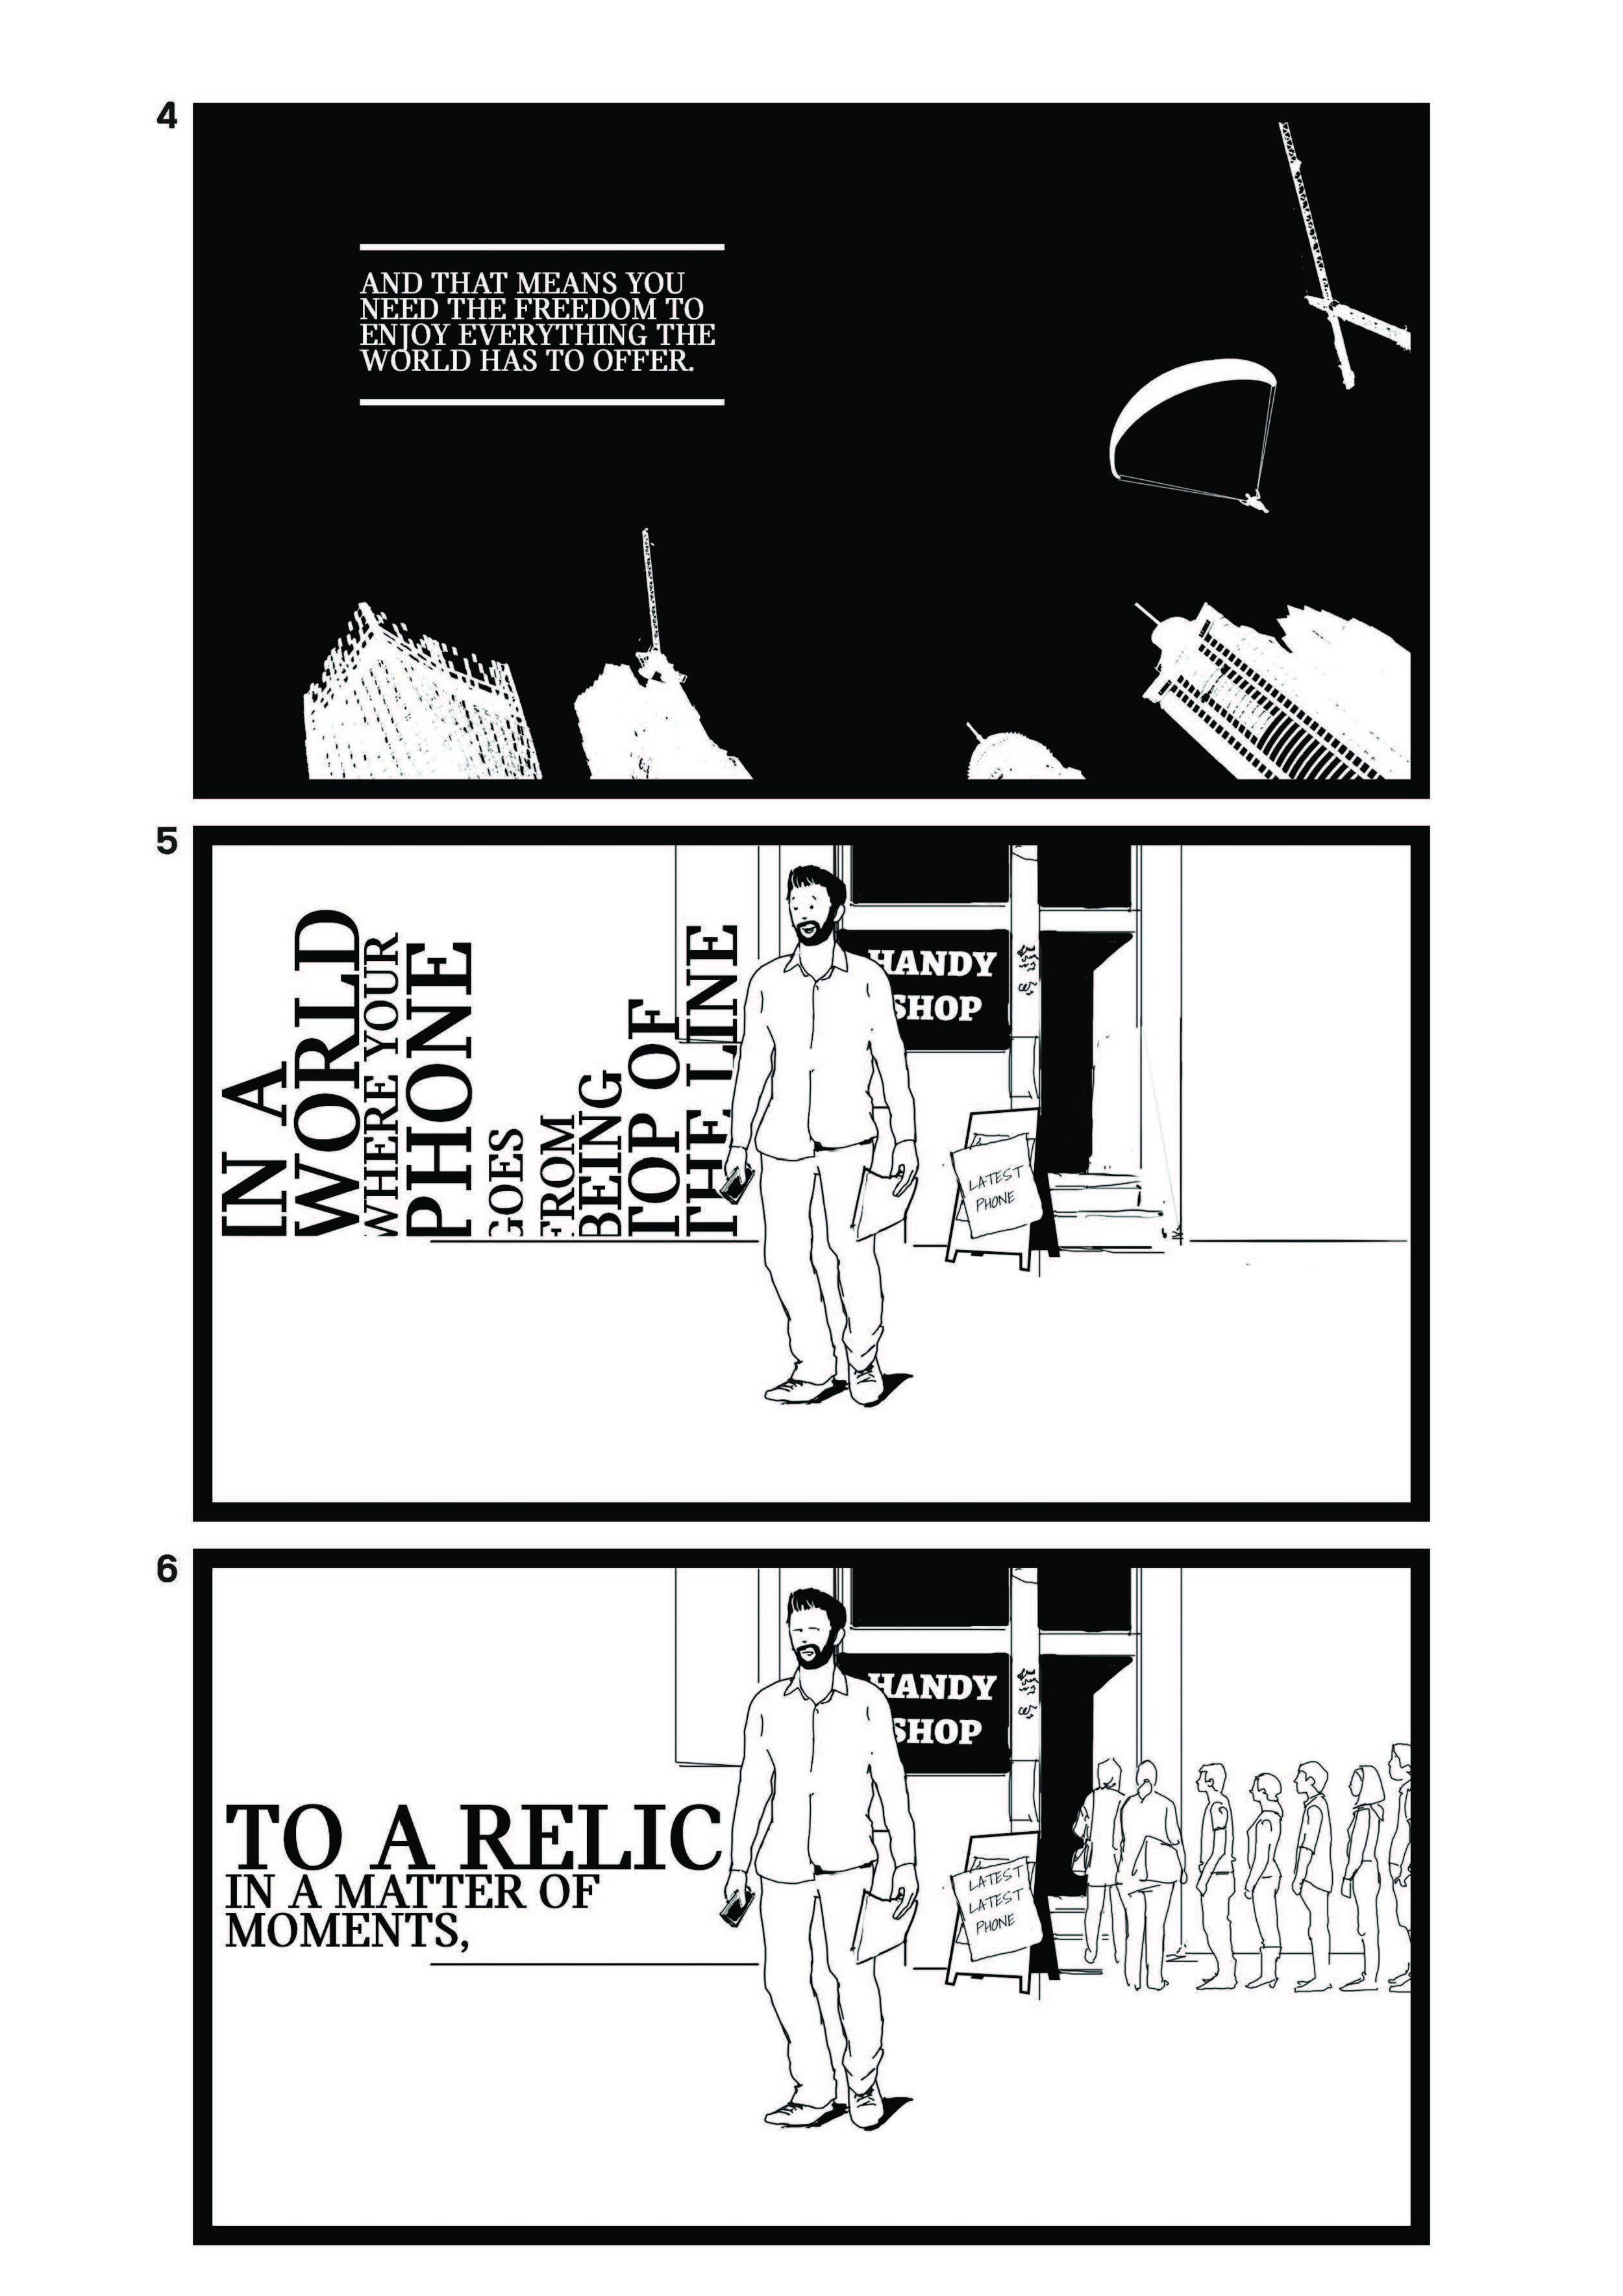 Storyboard_MINI_leasing_v4_final_Page_4.jpg